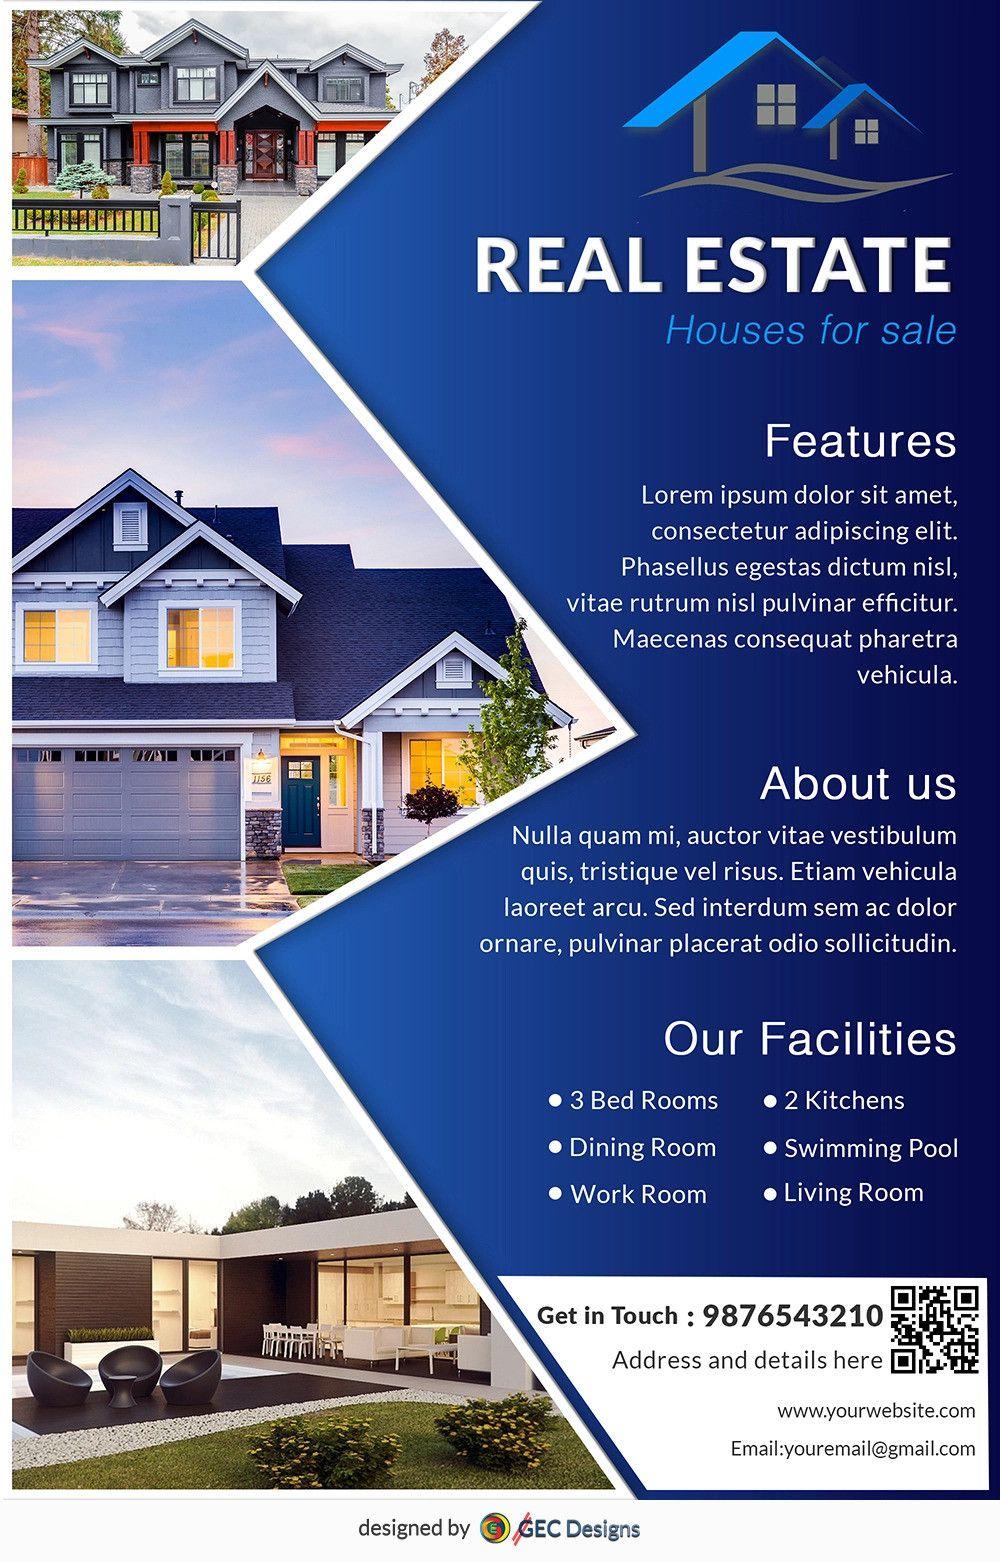 House Designs For Sale 2021 Desain Brosur Brosur Desain Banner